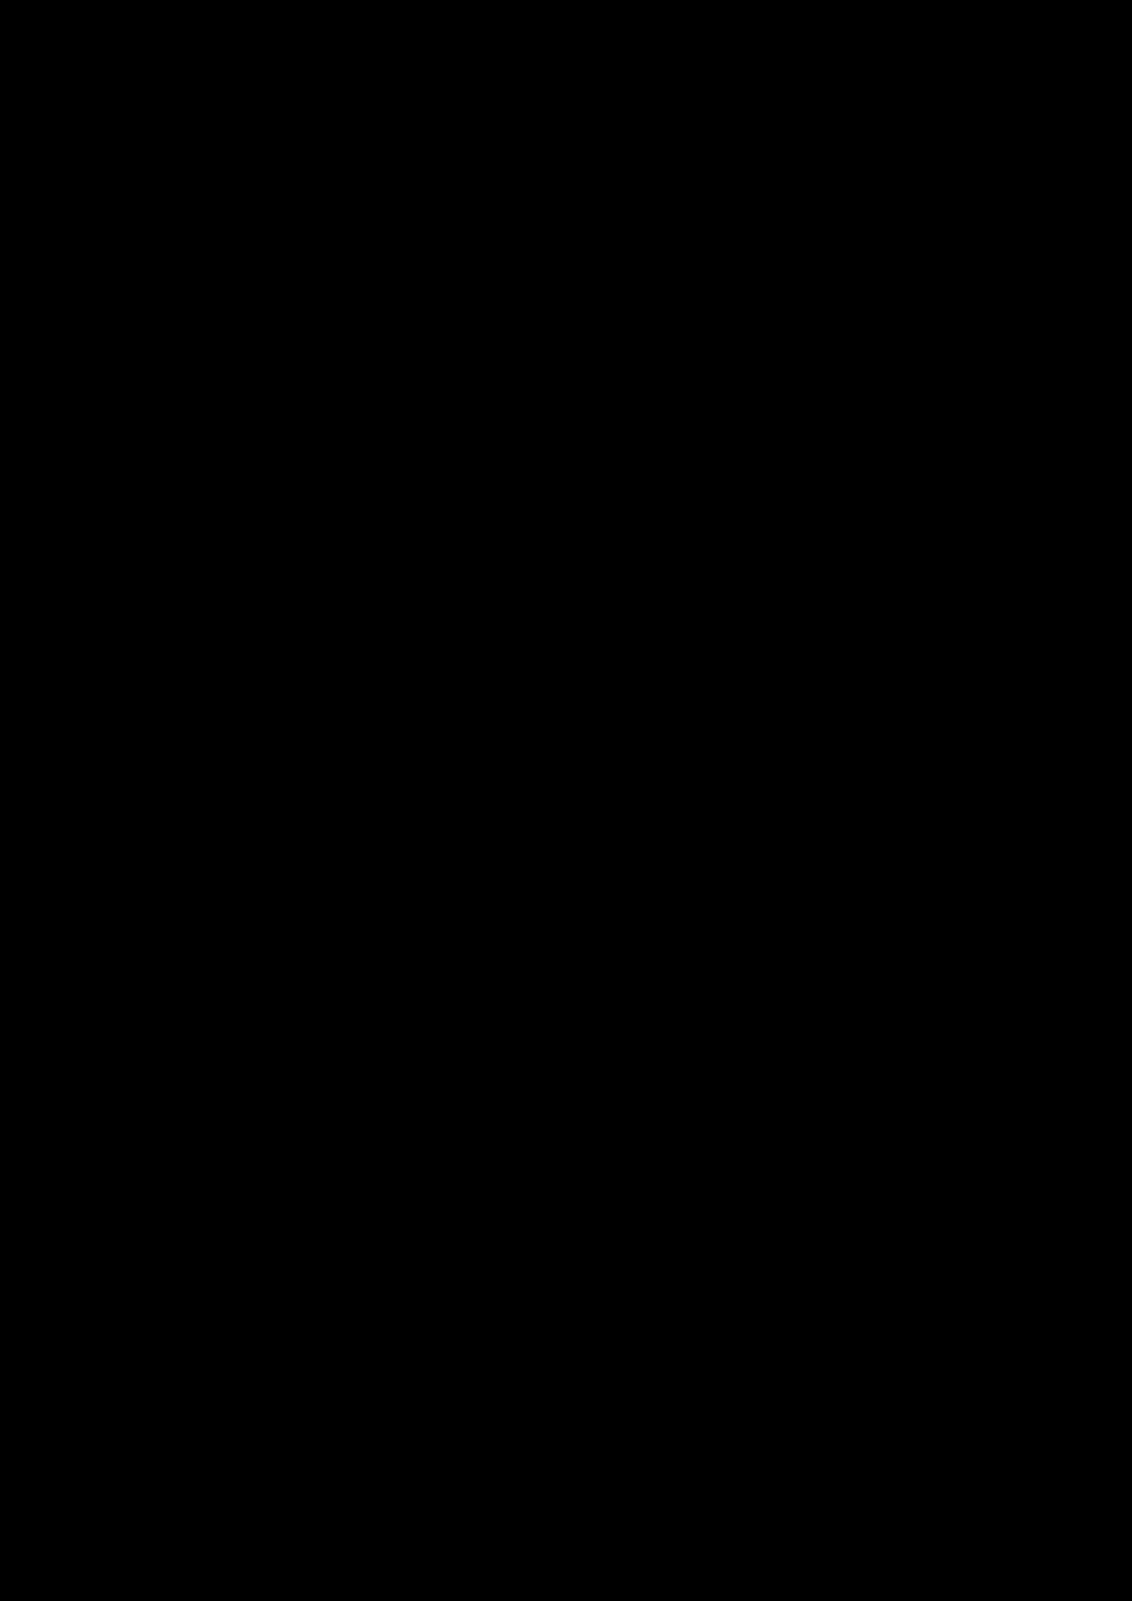 Ot Bolshogo Uma slide, Image 7